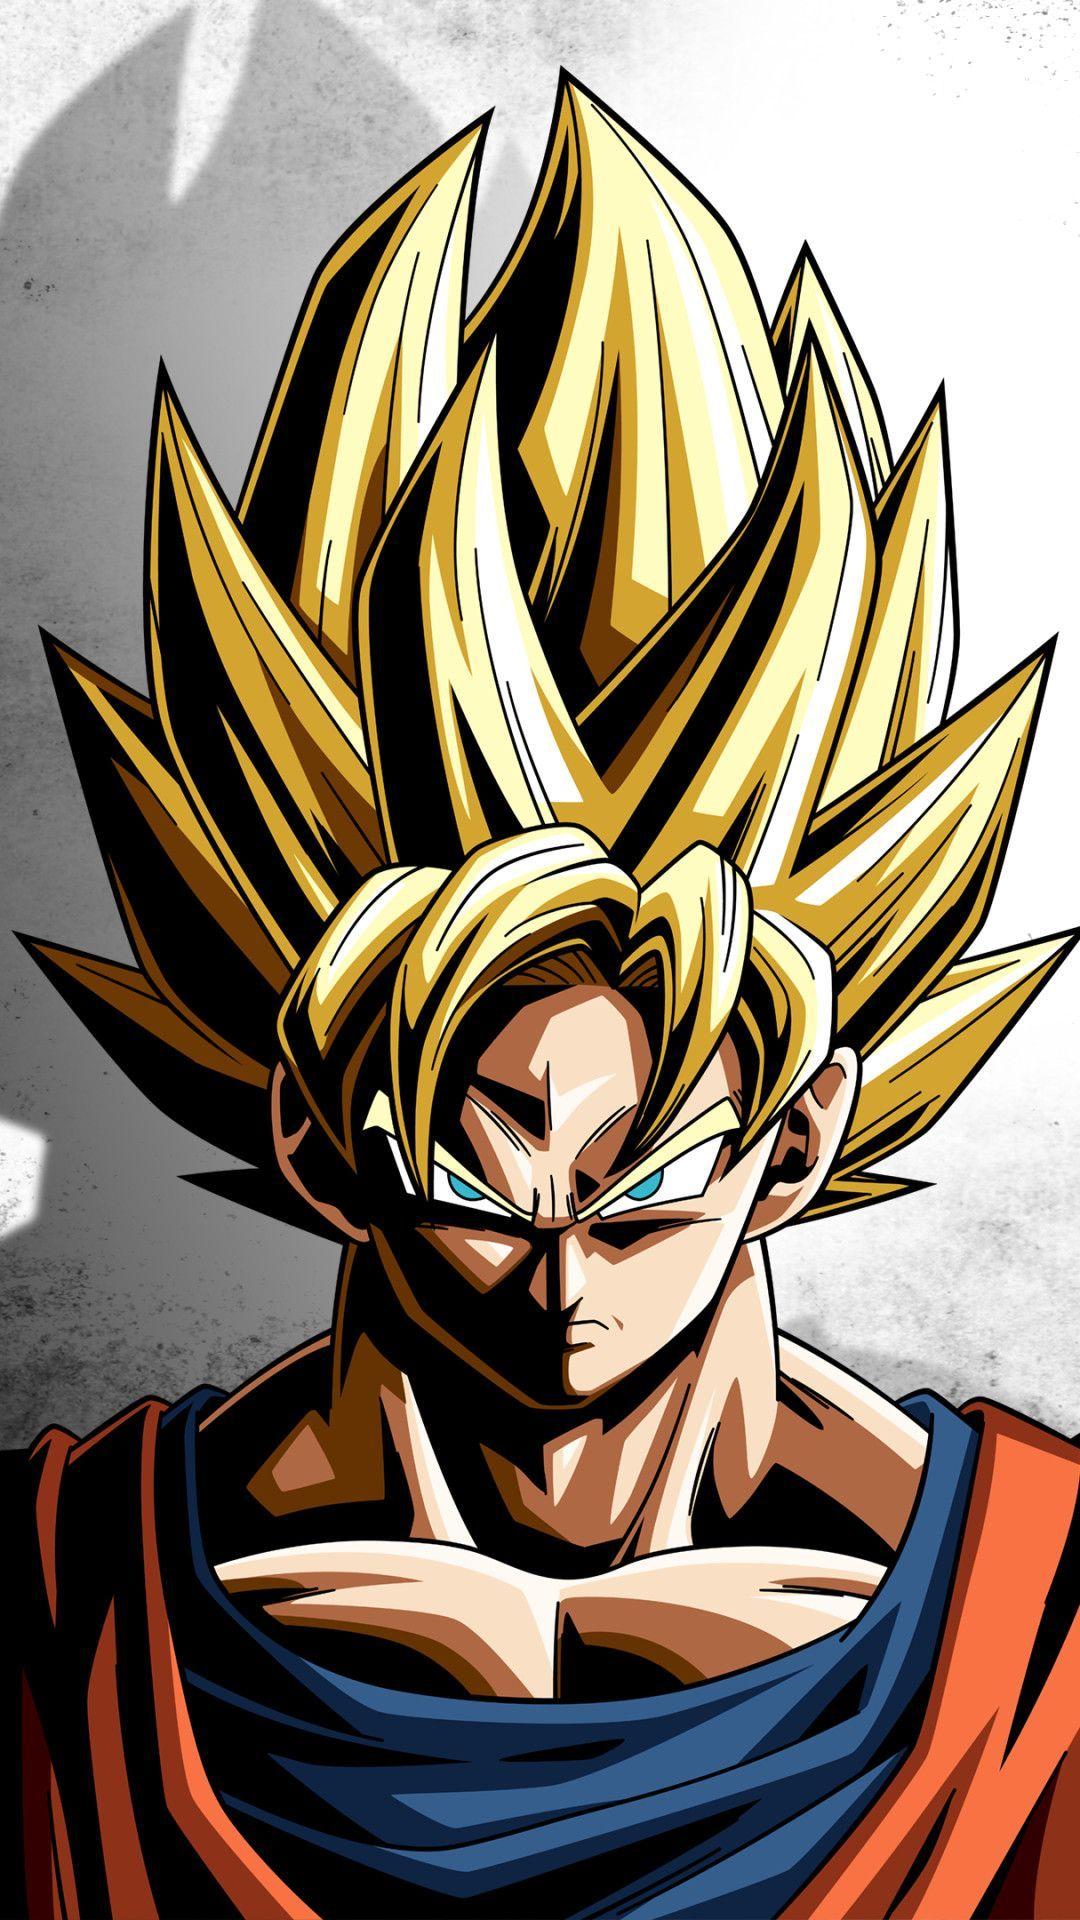 Dragon Ball Z Anime Iphone Wallpapers Iphonewallpapers Dragon Ball Super Goku Dragon Ball Wallpaper Iphone Dragon Ball Z Iphone Wallpaper